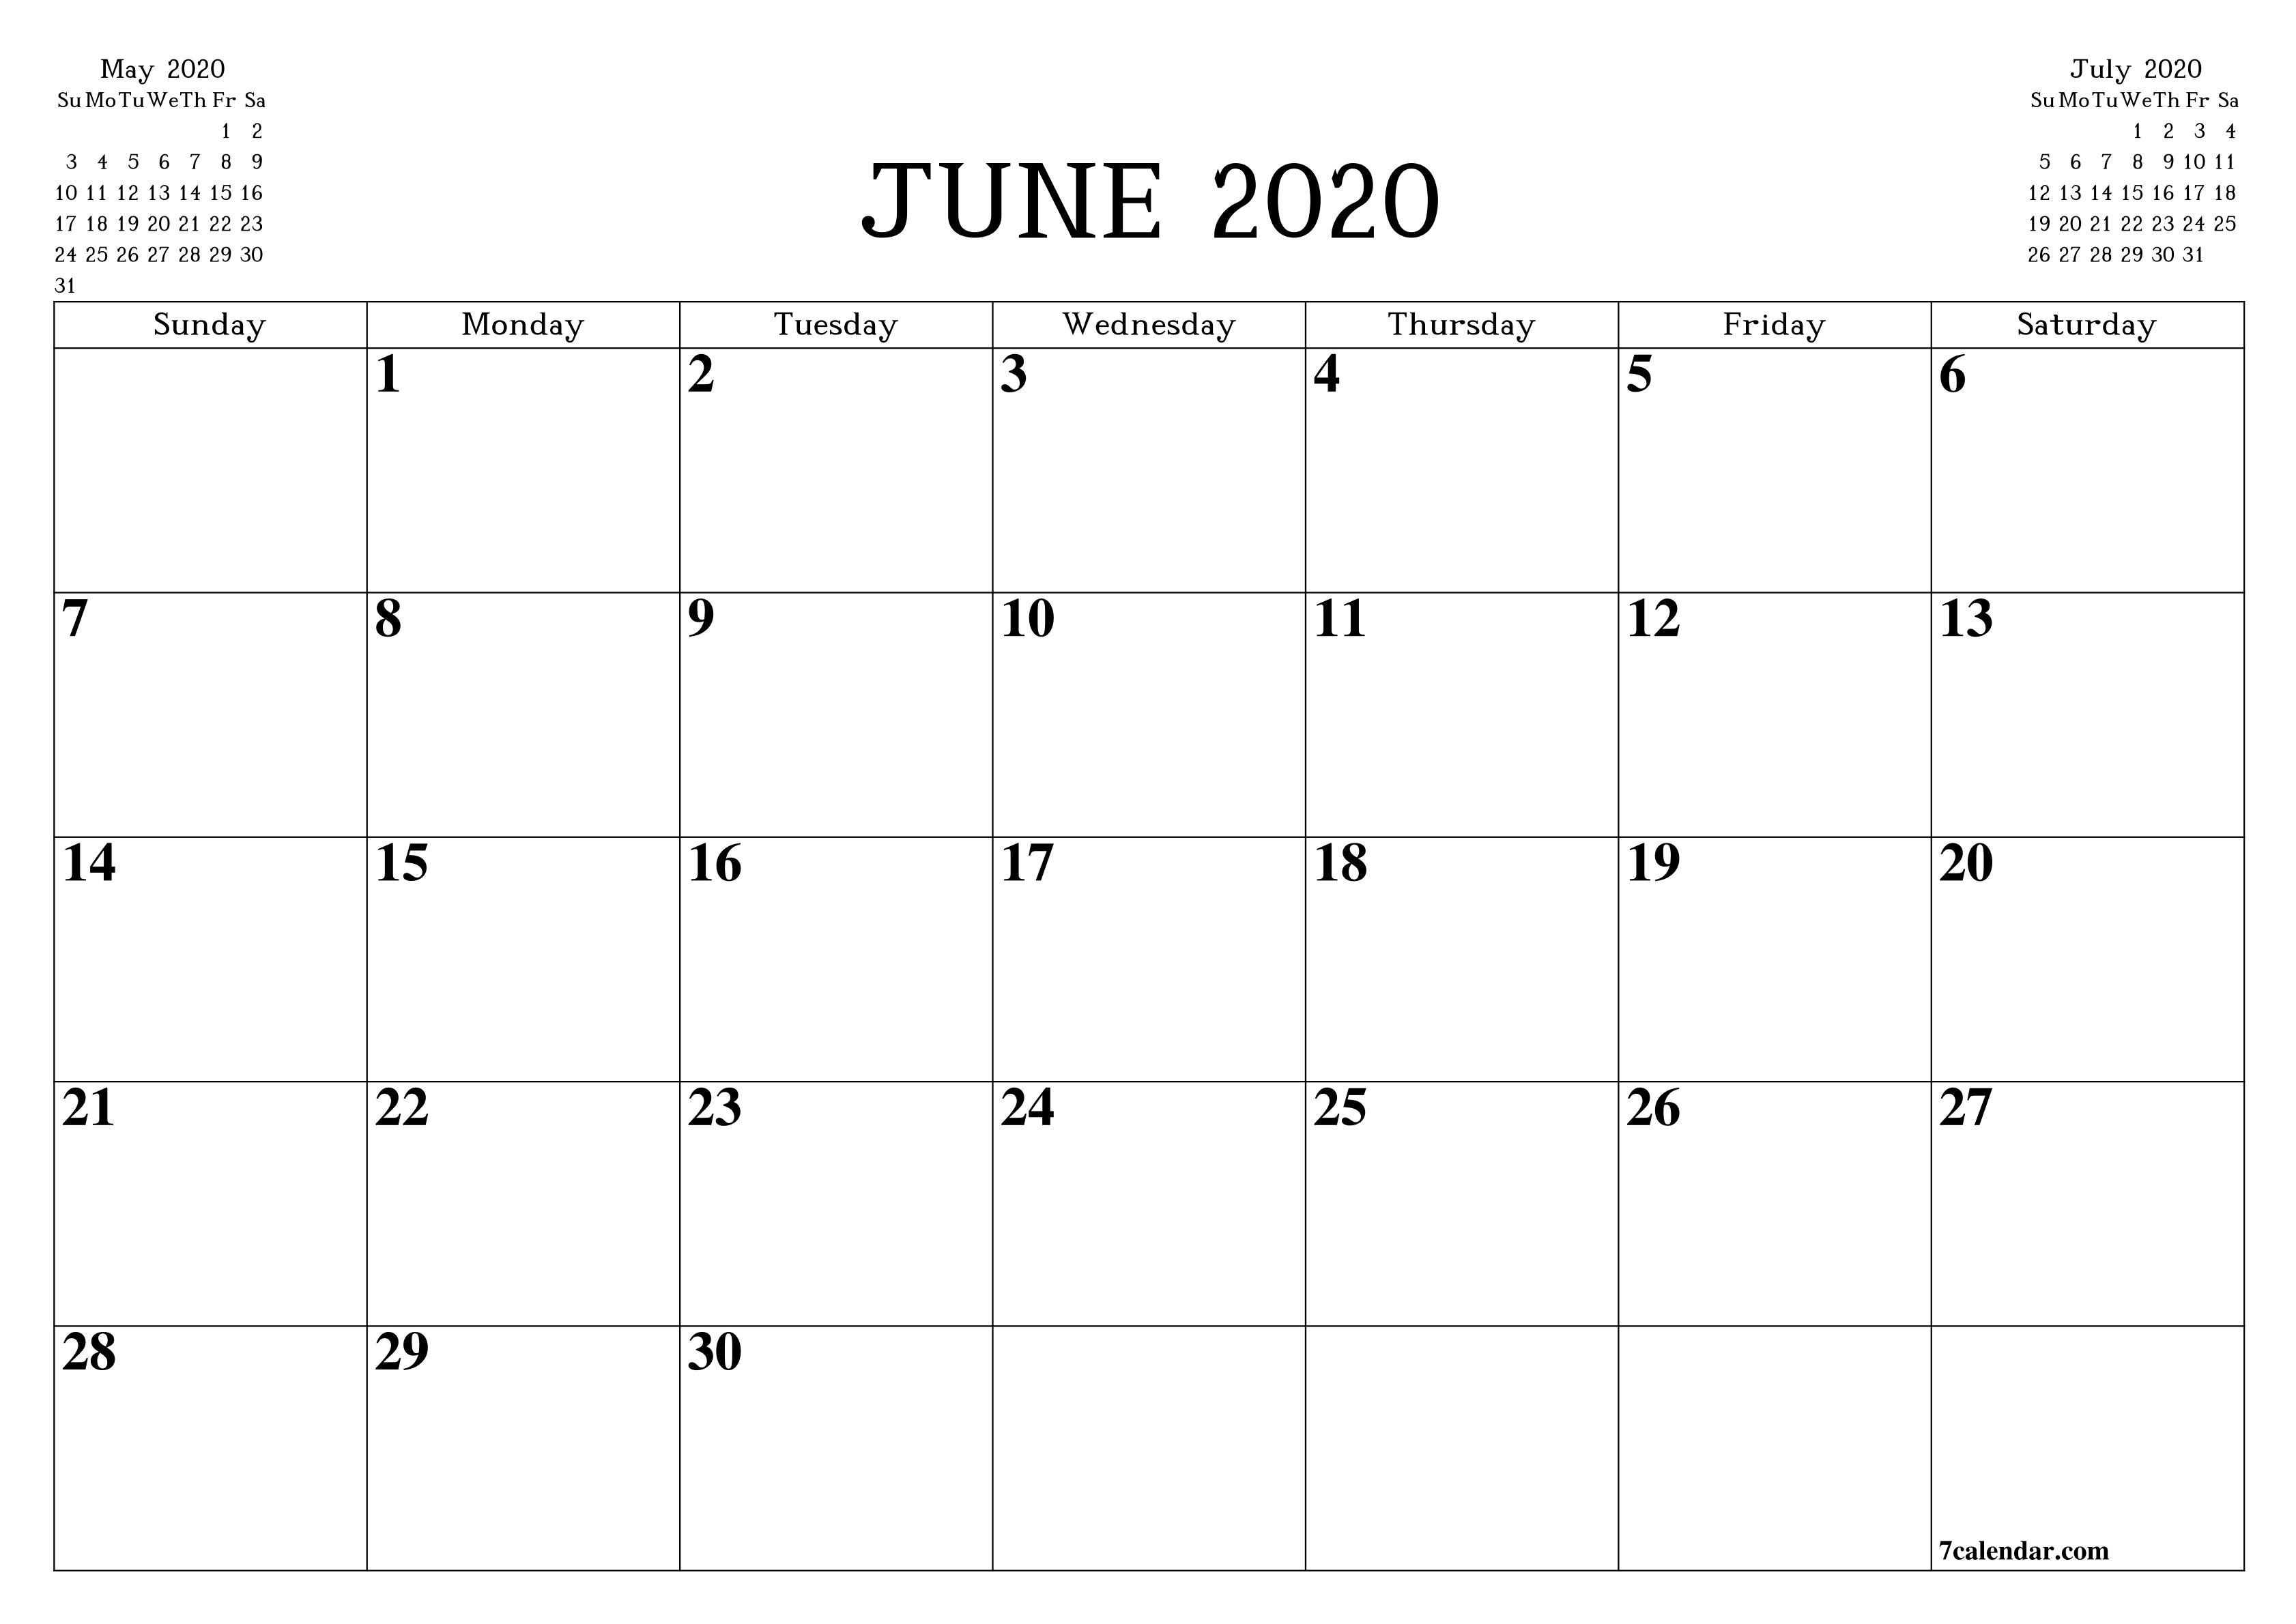 Free Printable Blank Monthly Calendar And Planner For June-Blank Calendar December 2020 Letter Size